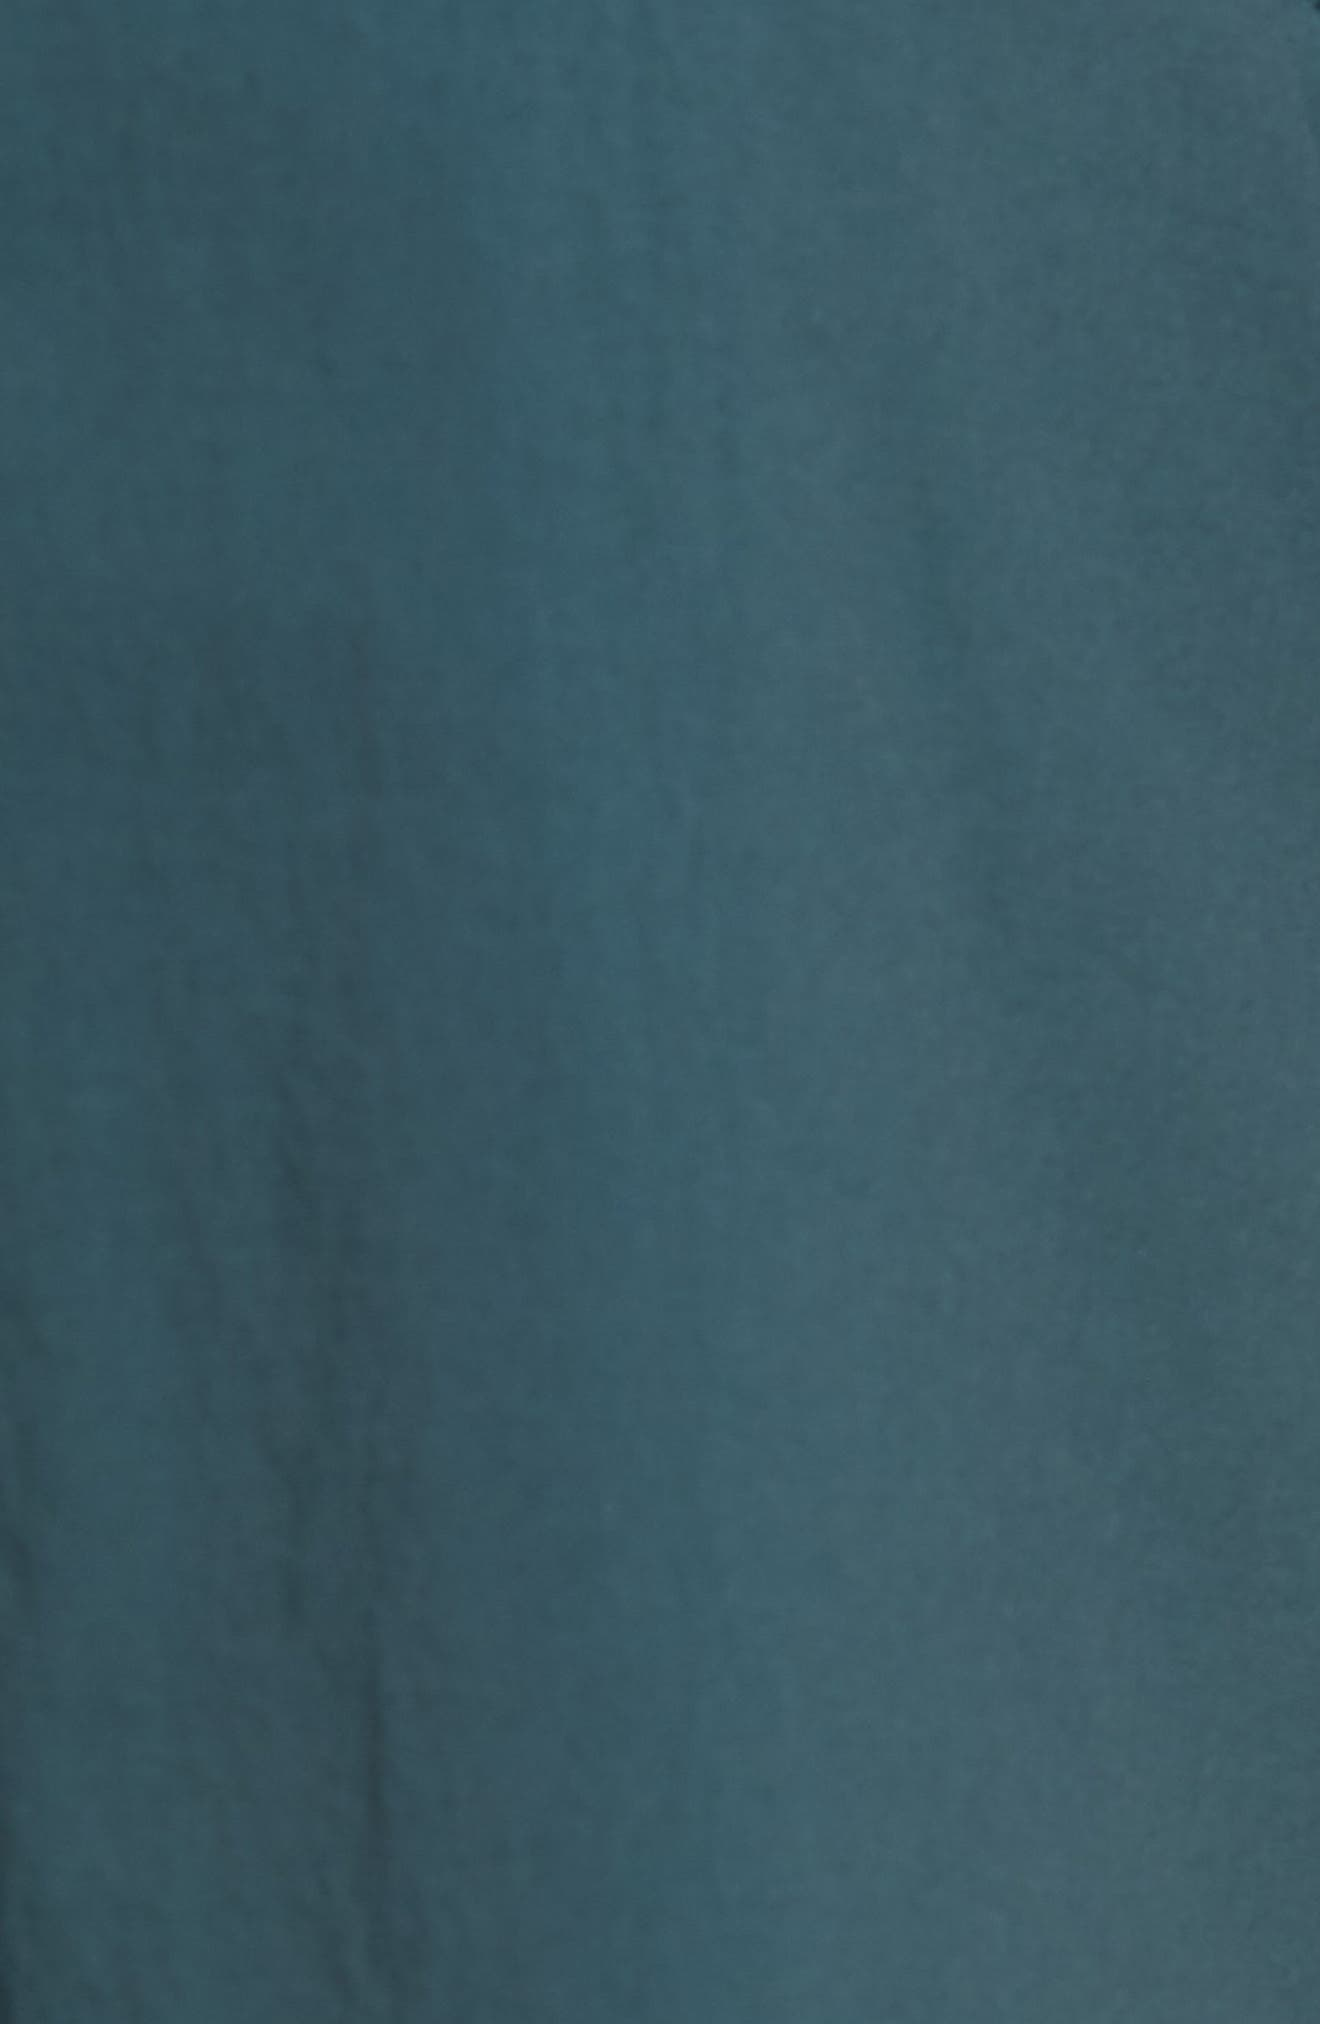 SB Flex Everett Shorts,                             Alternate thumbnail 5, color,                             DEEP JUNGLE/ BLACK